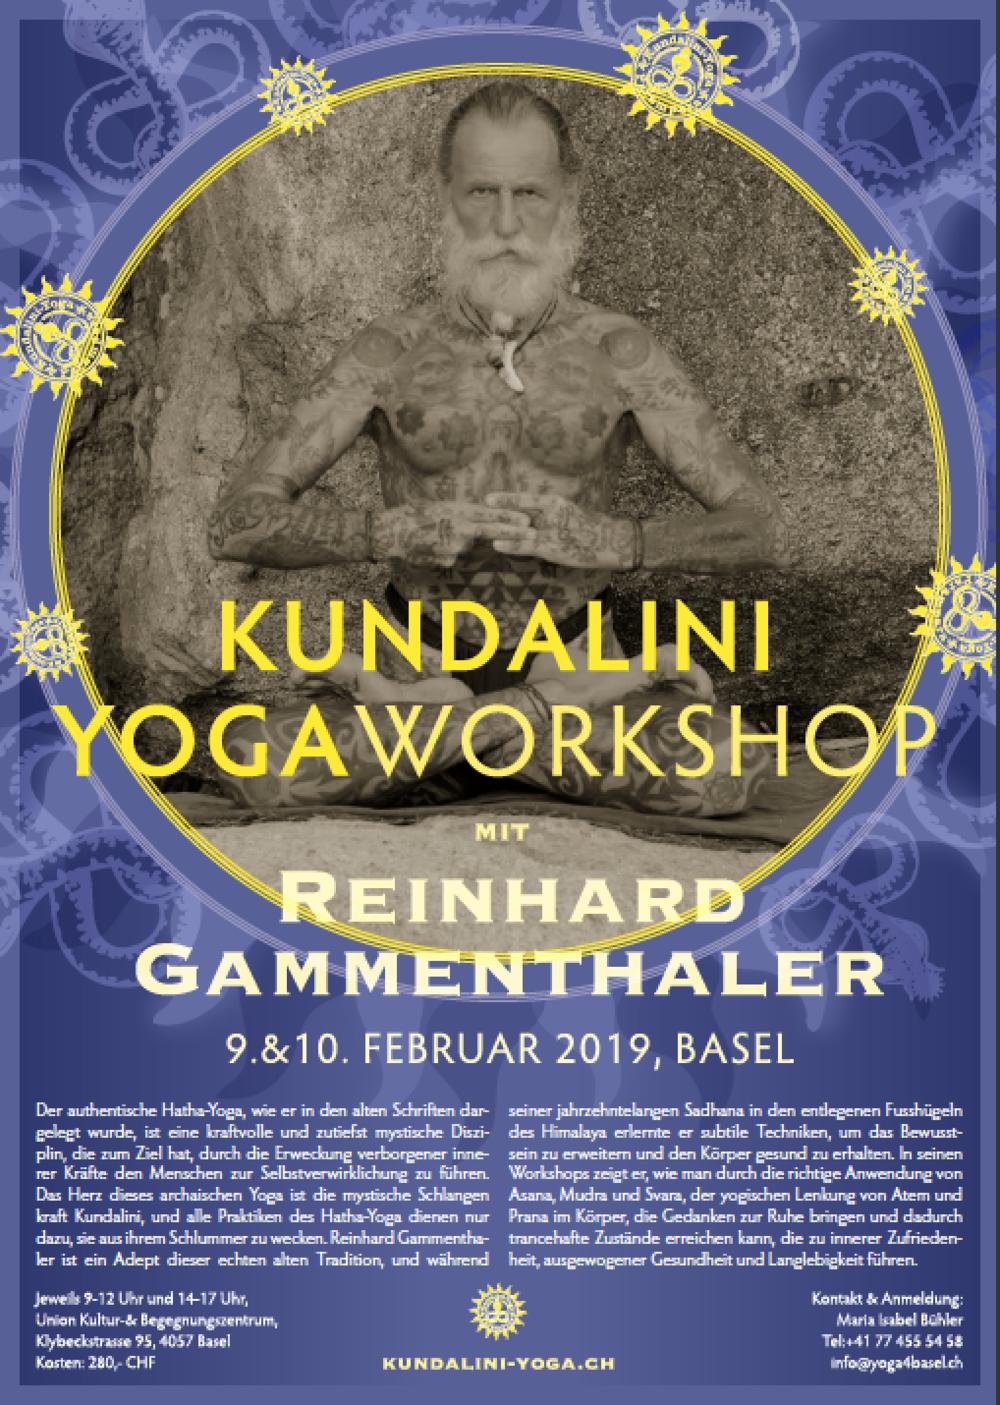 Workshop Kundalini Yoga Switzerland - poster series for the annual workshop with Reinhard Gammenthaler2016 | 2017 | 2018